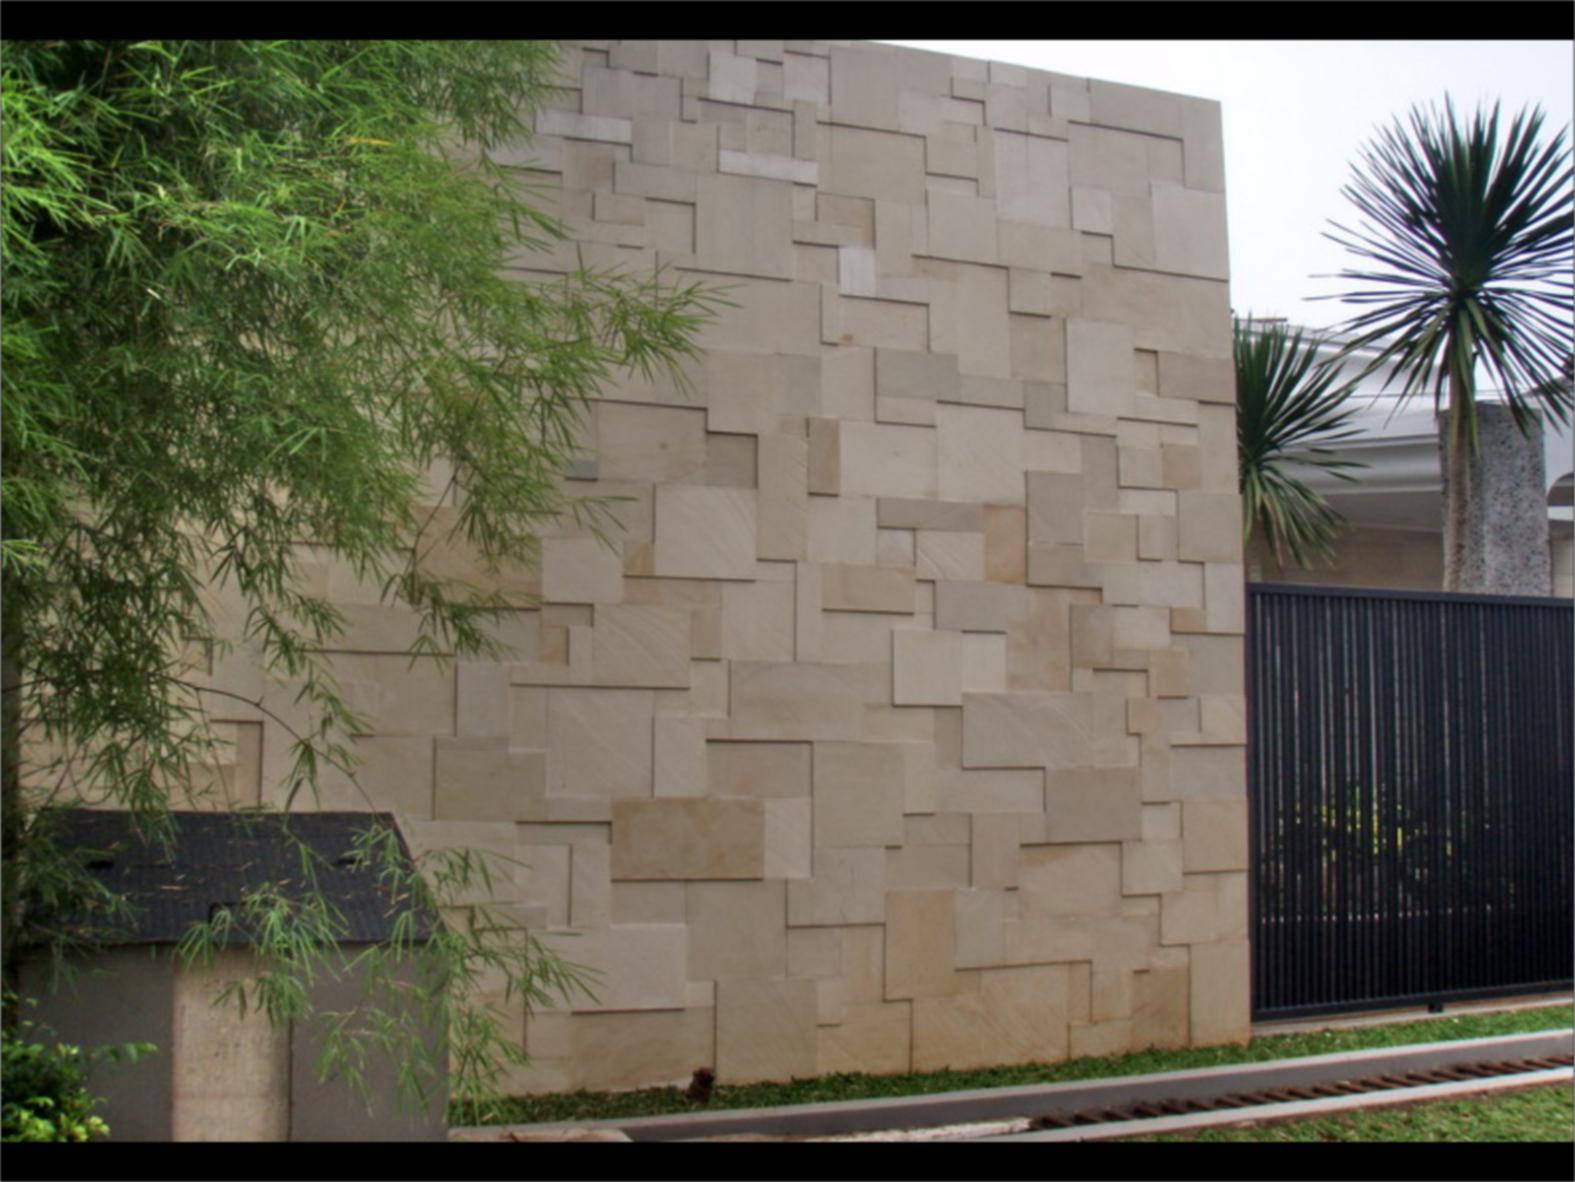 pin tembok pagar batu alam gambar trovit rumah on pinterest